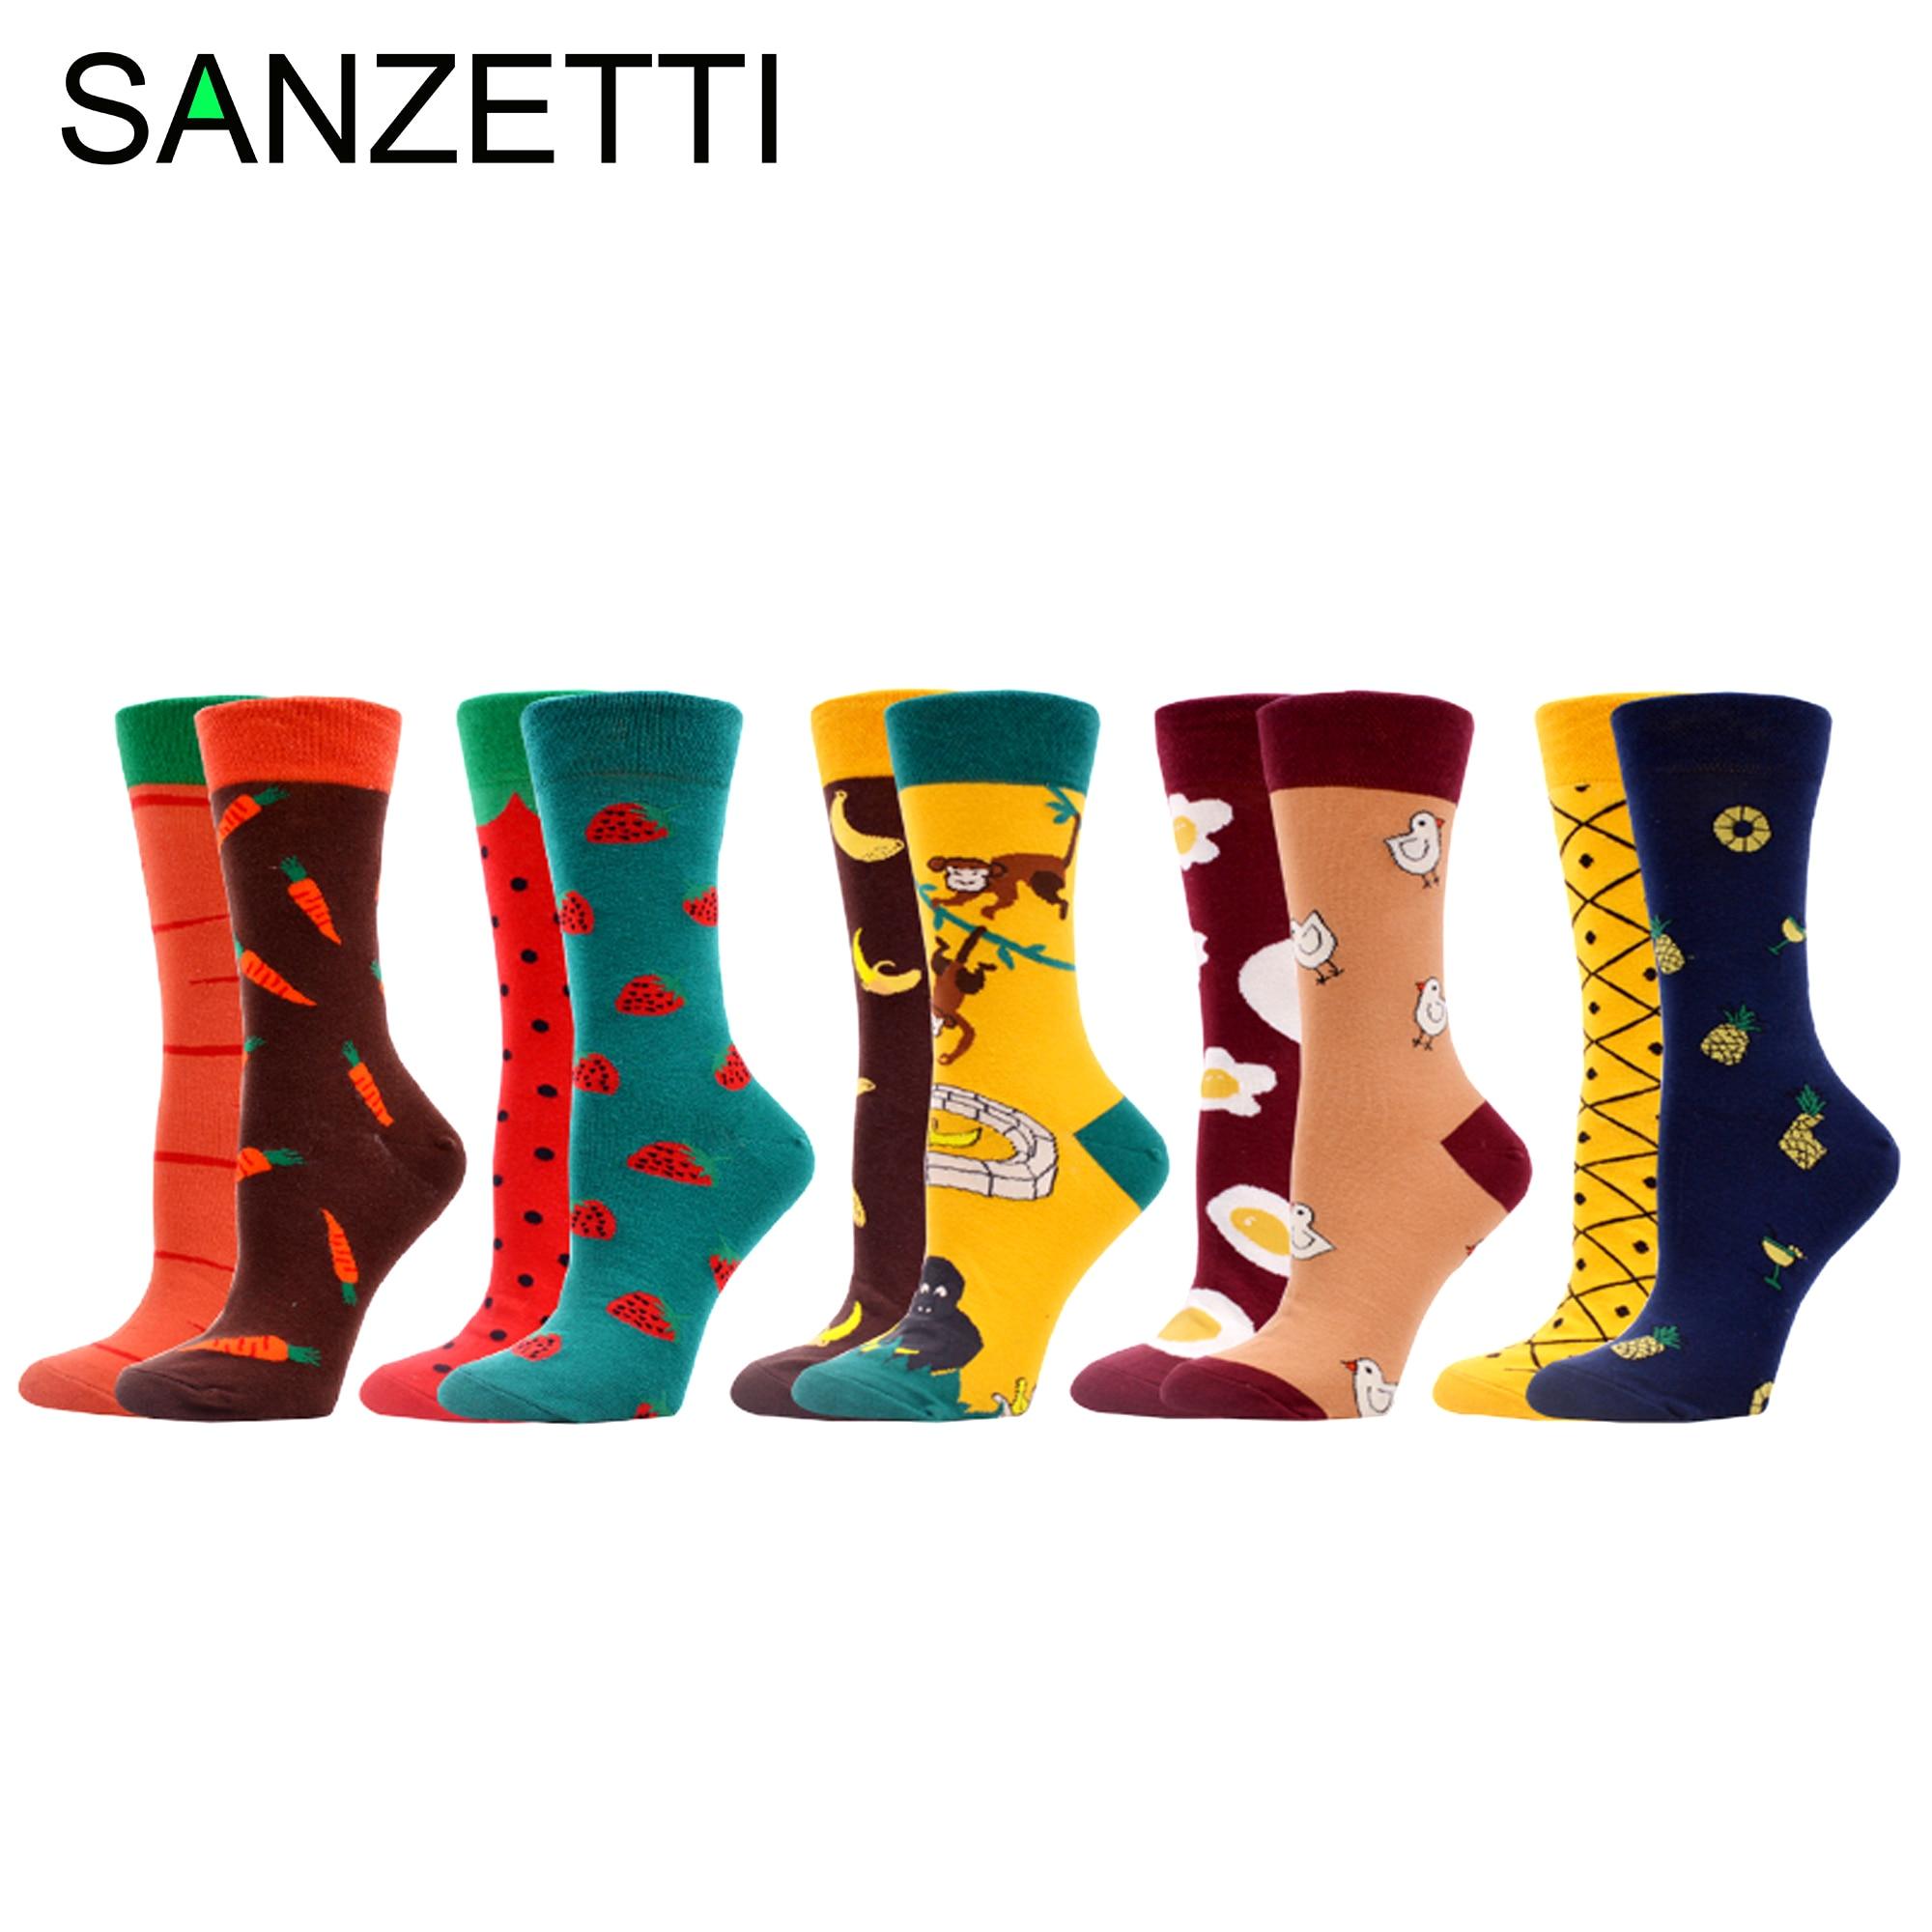 SANZETTI/5 пар женских носков-лодочек Happy Creative Shuangpin, яркие носки с ярким узором в стиле Харадзюку, новинка, носки для свадебного платья